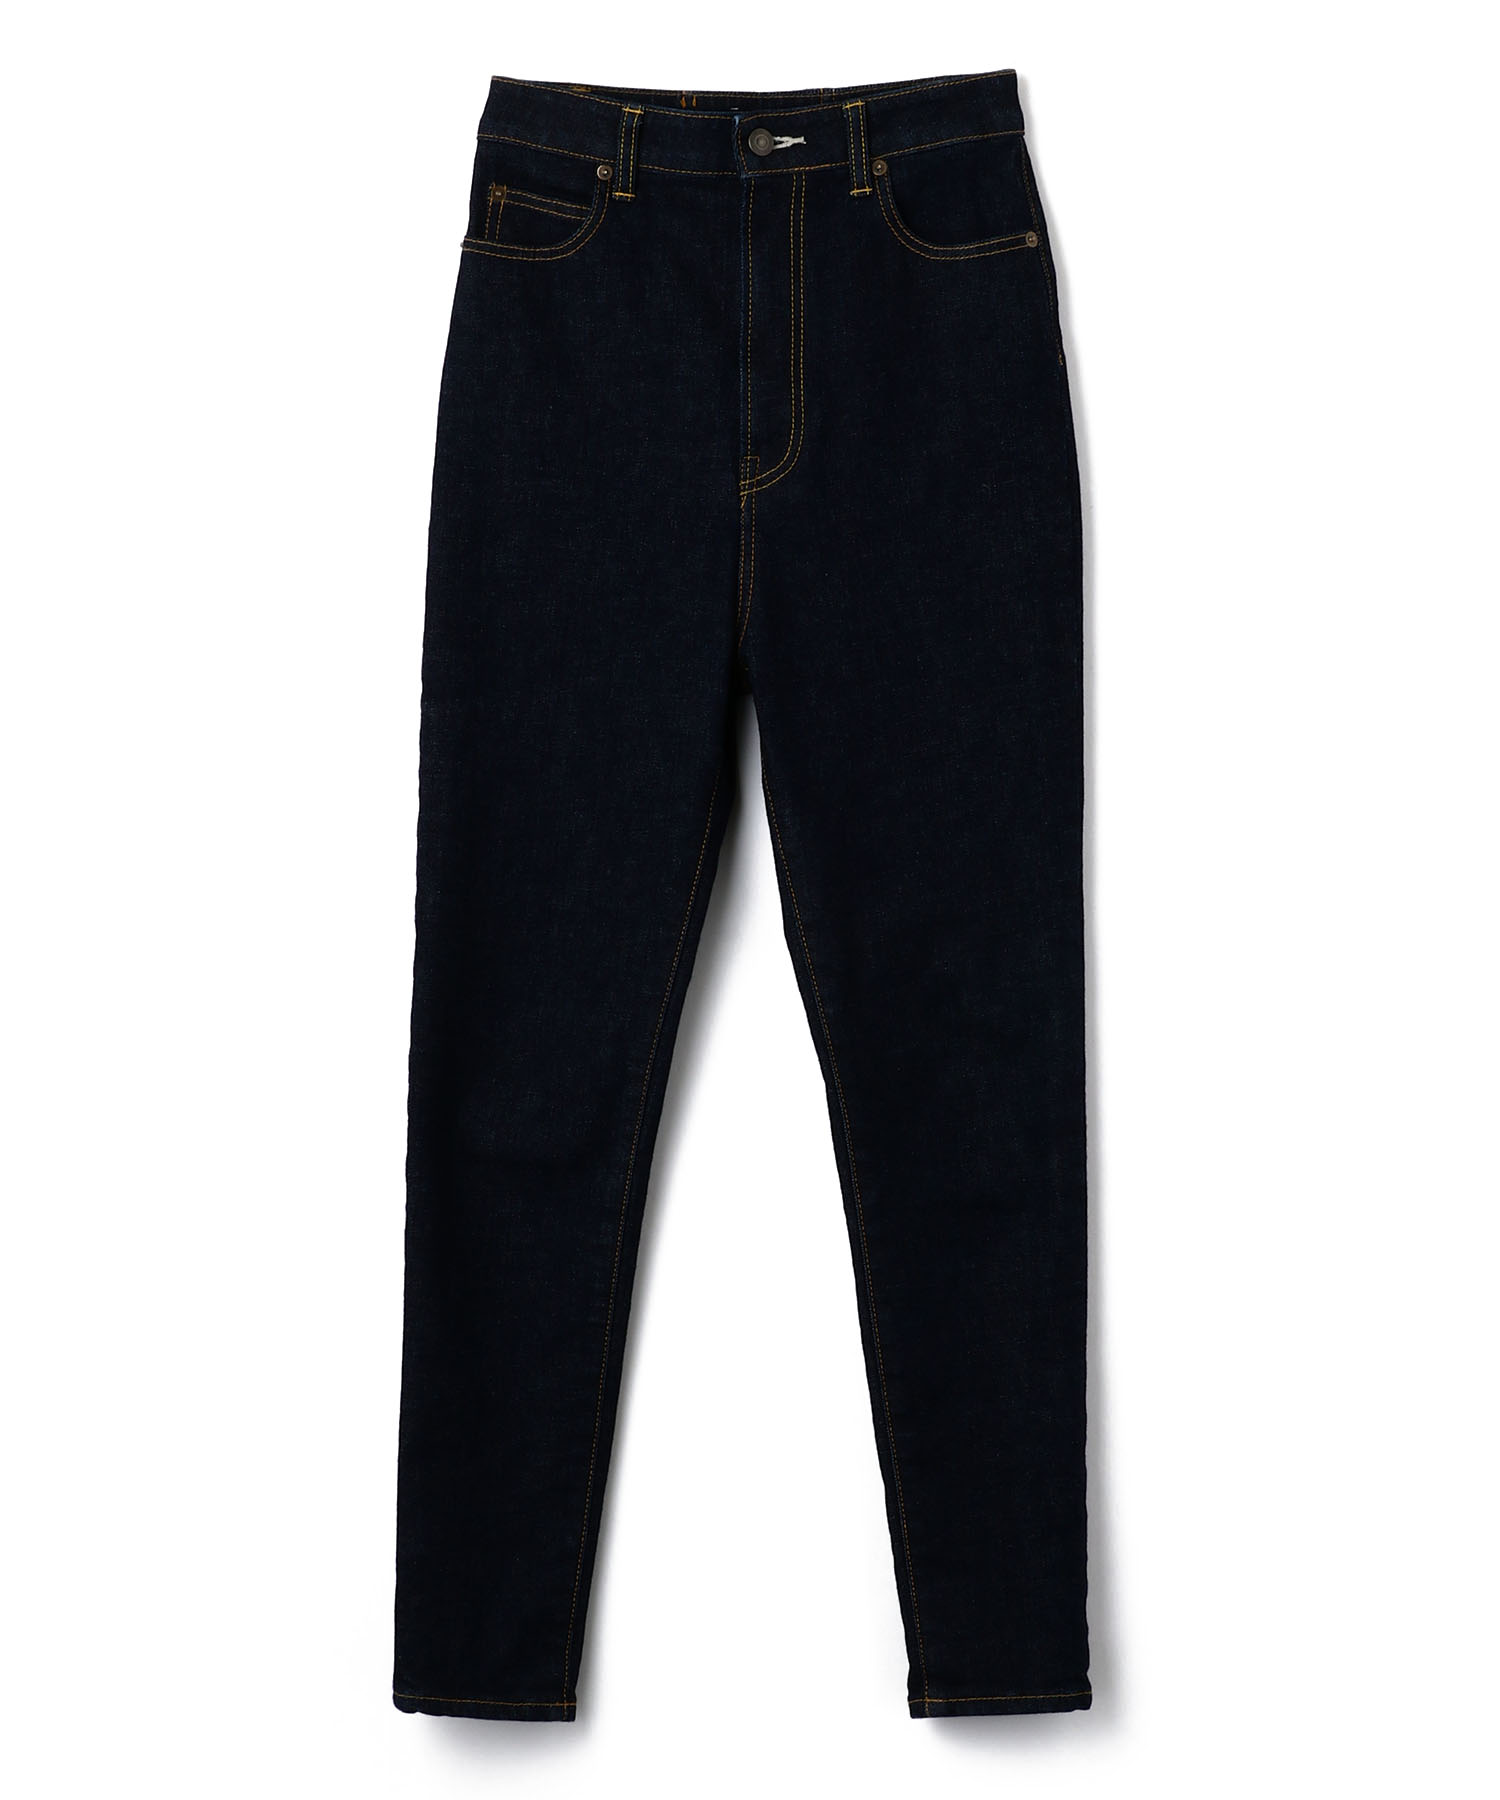 Back Lace Up Skinny  Pants